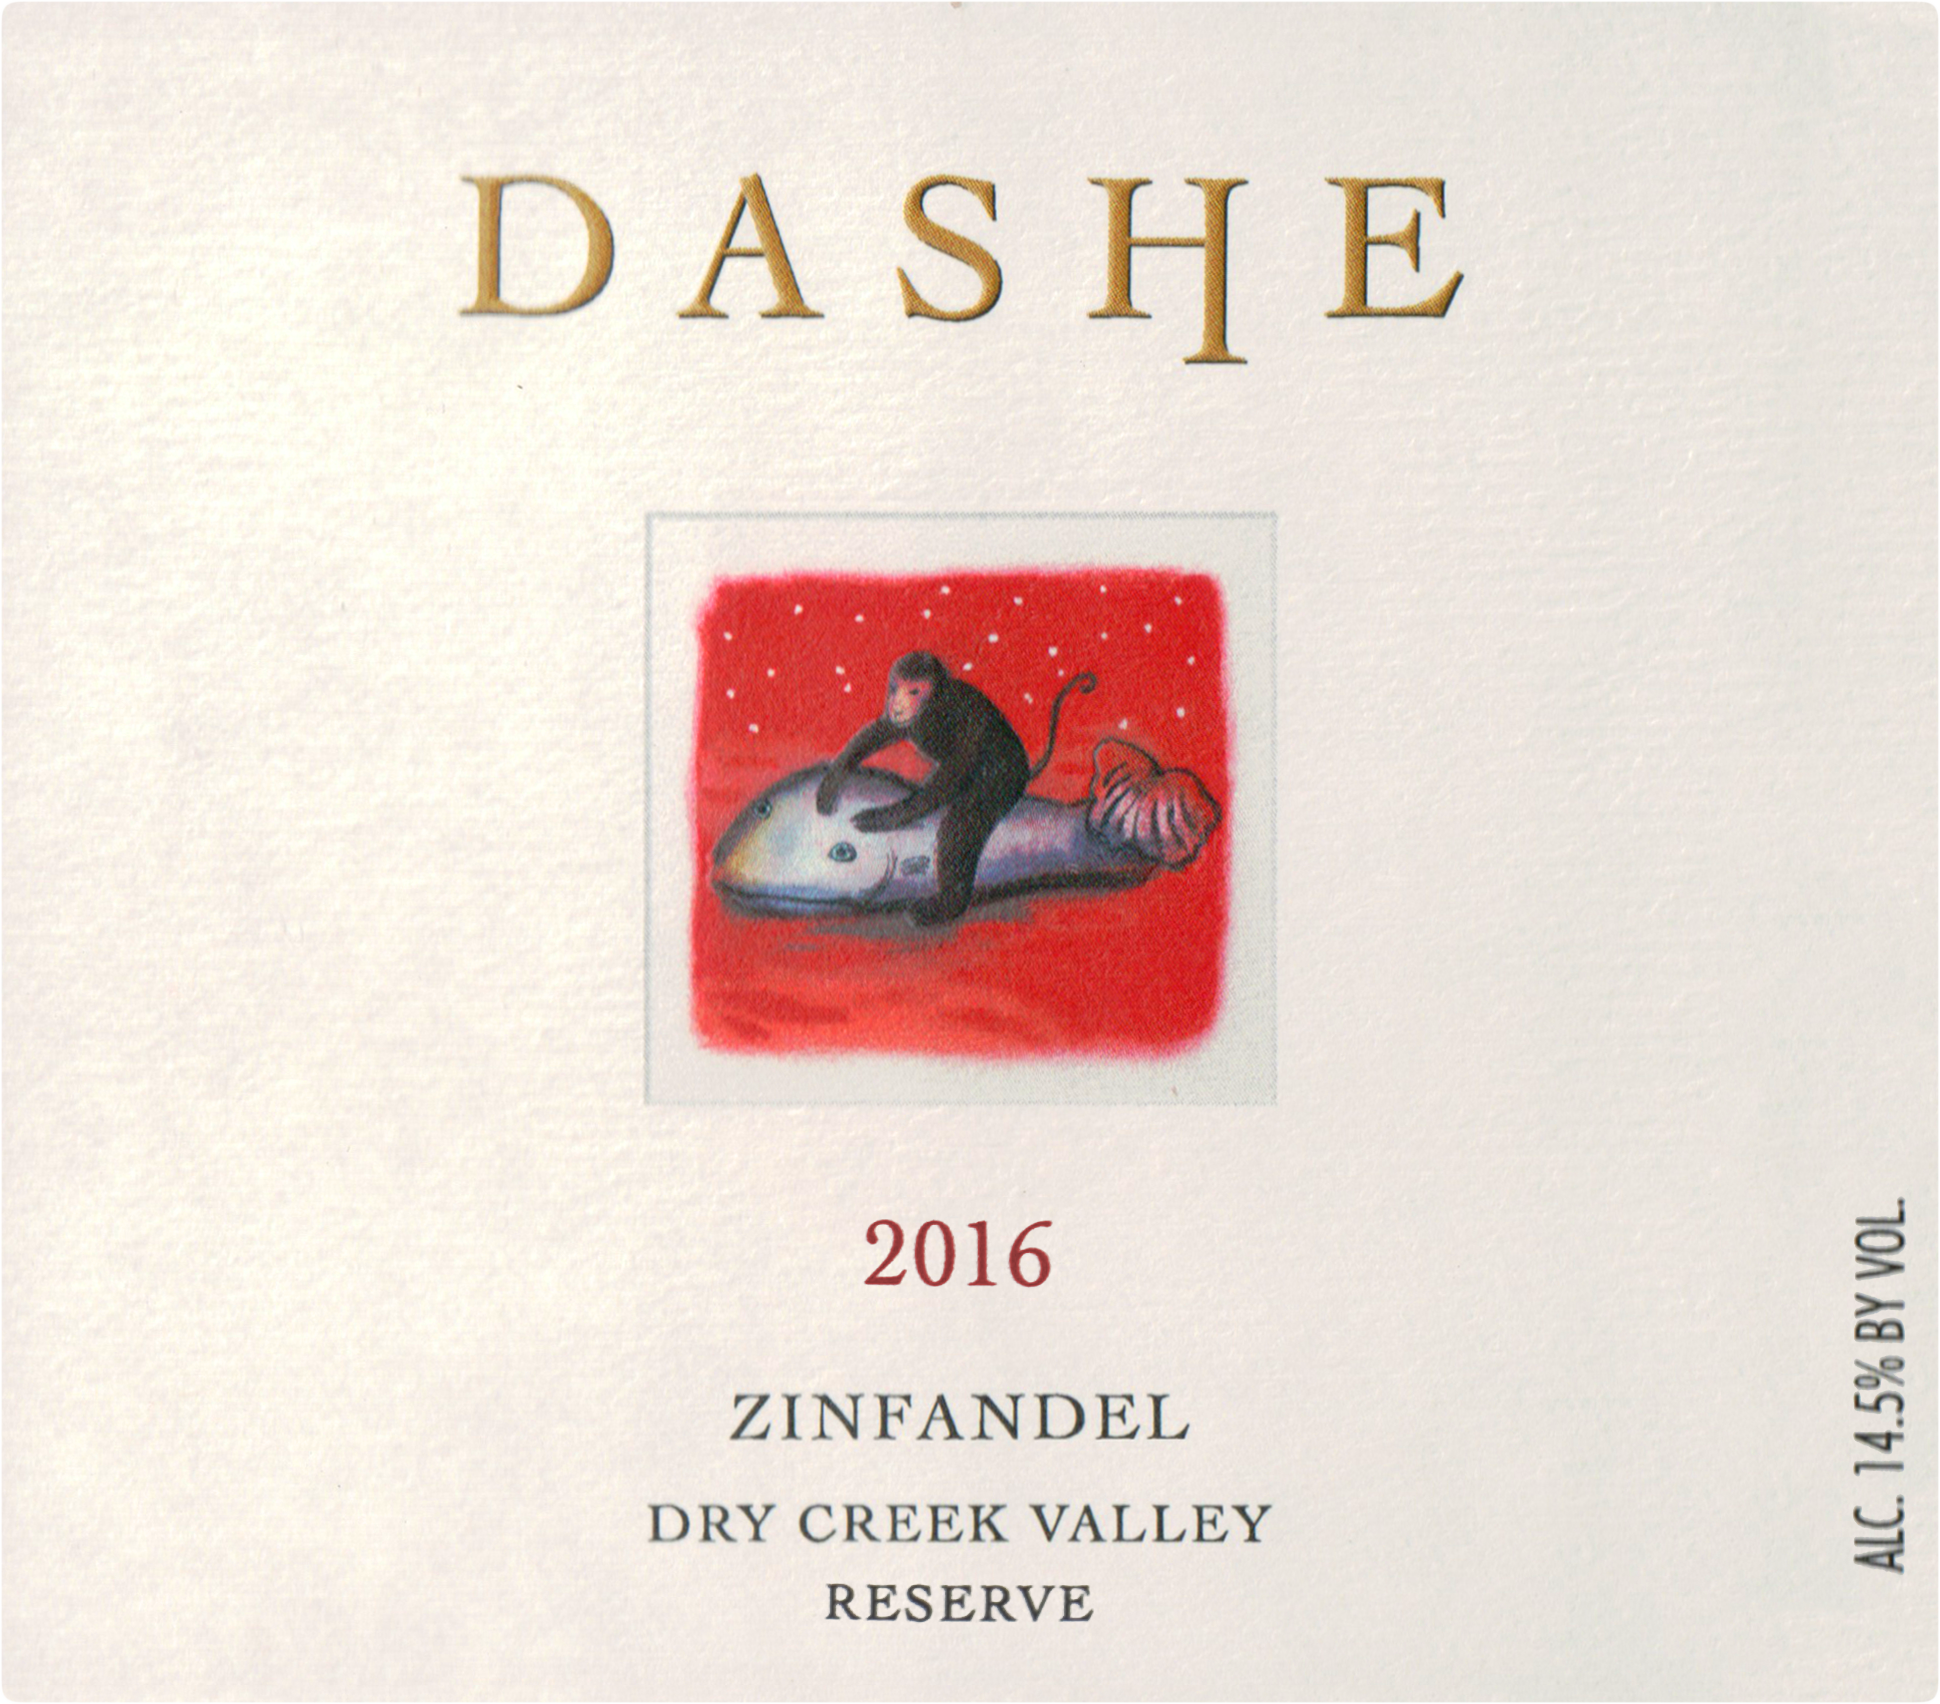 Dashe Dry Creek Zinfandel 2016